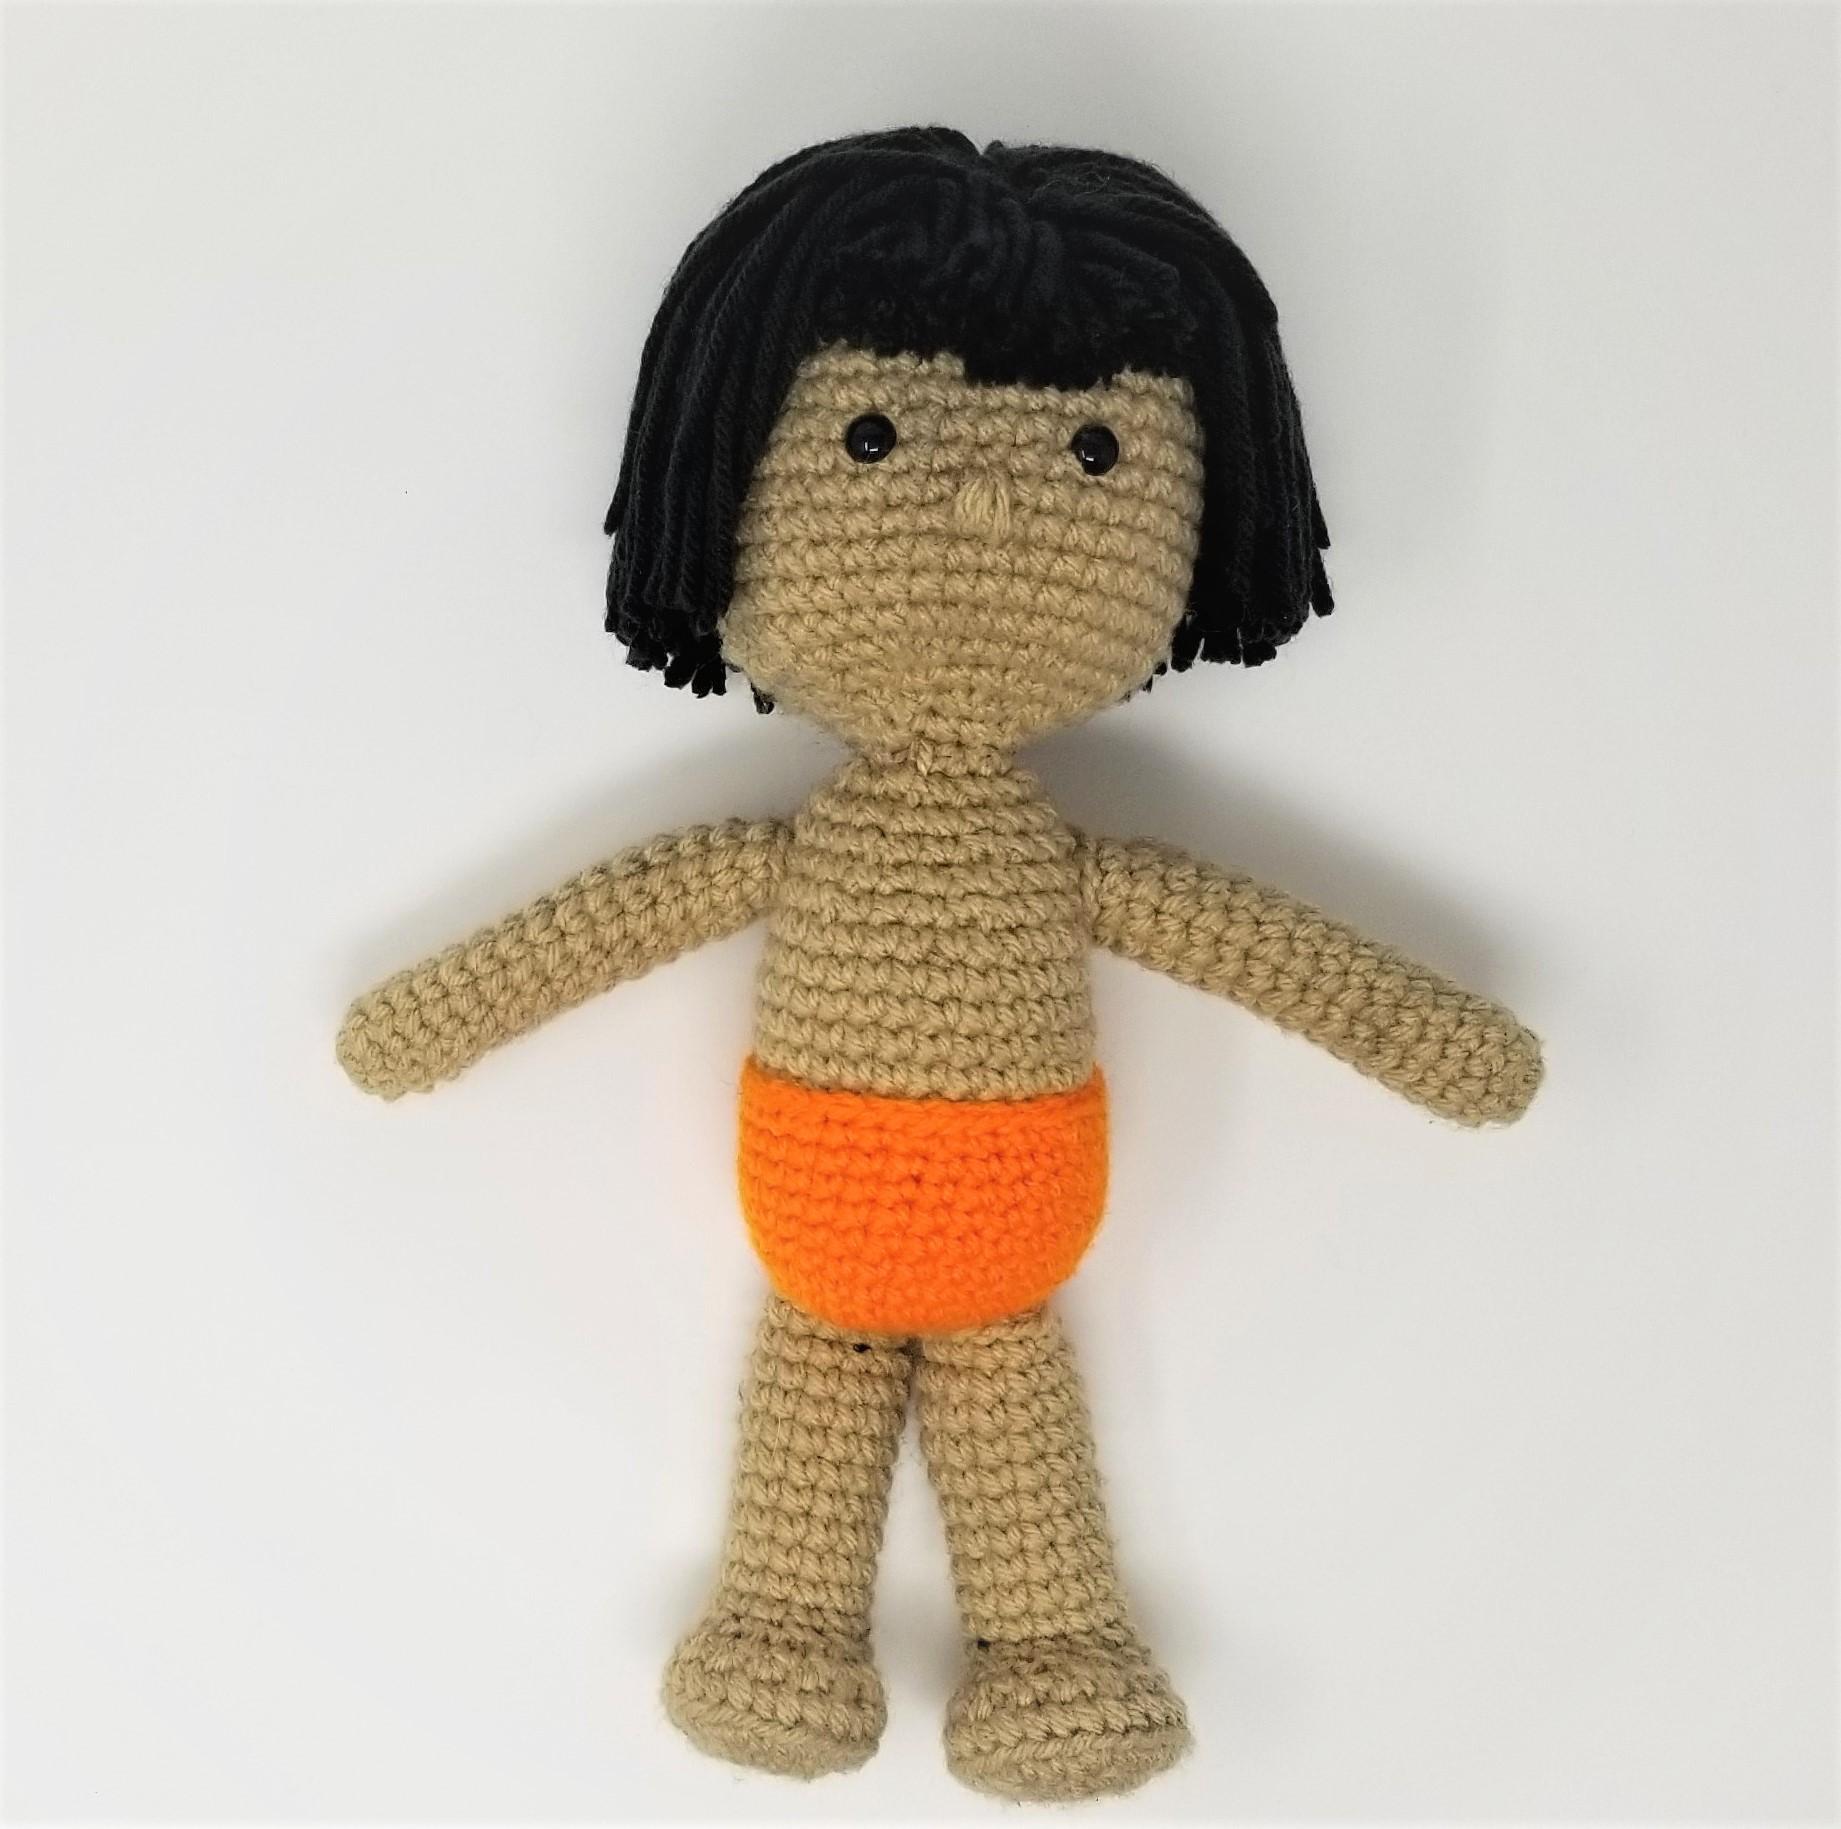 Amigurumi Crochet Doll Book using Japanese Symbols - Wish I Were ... | 1829x1841